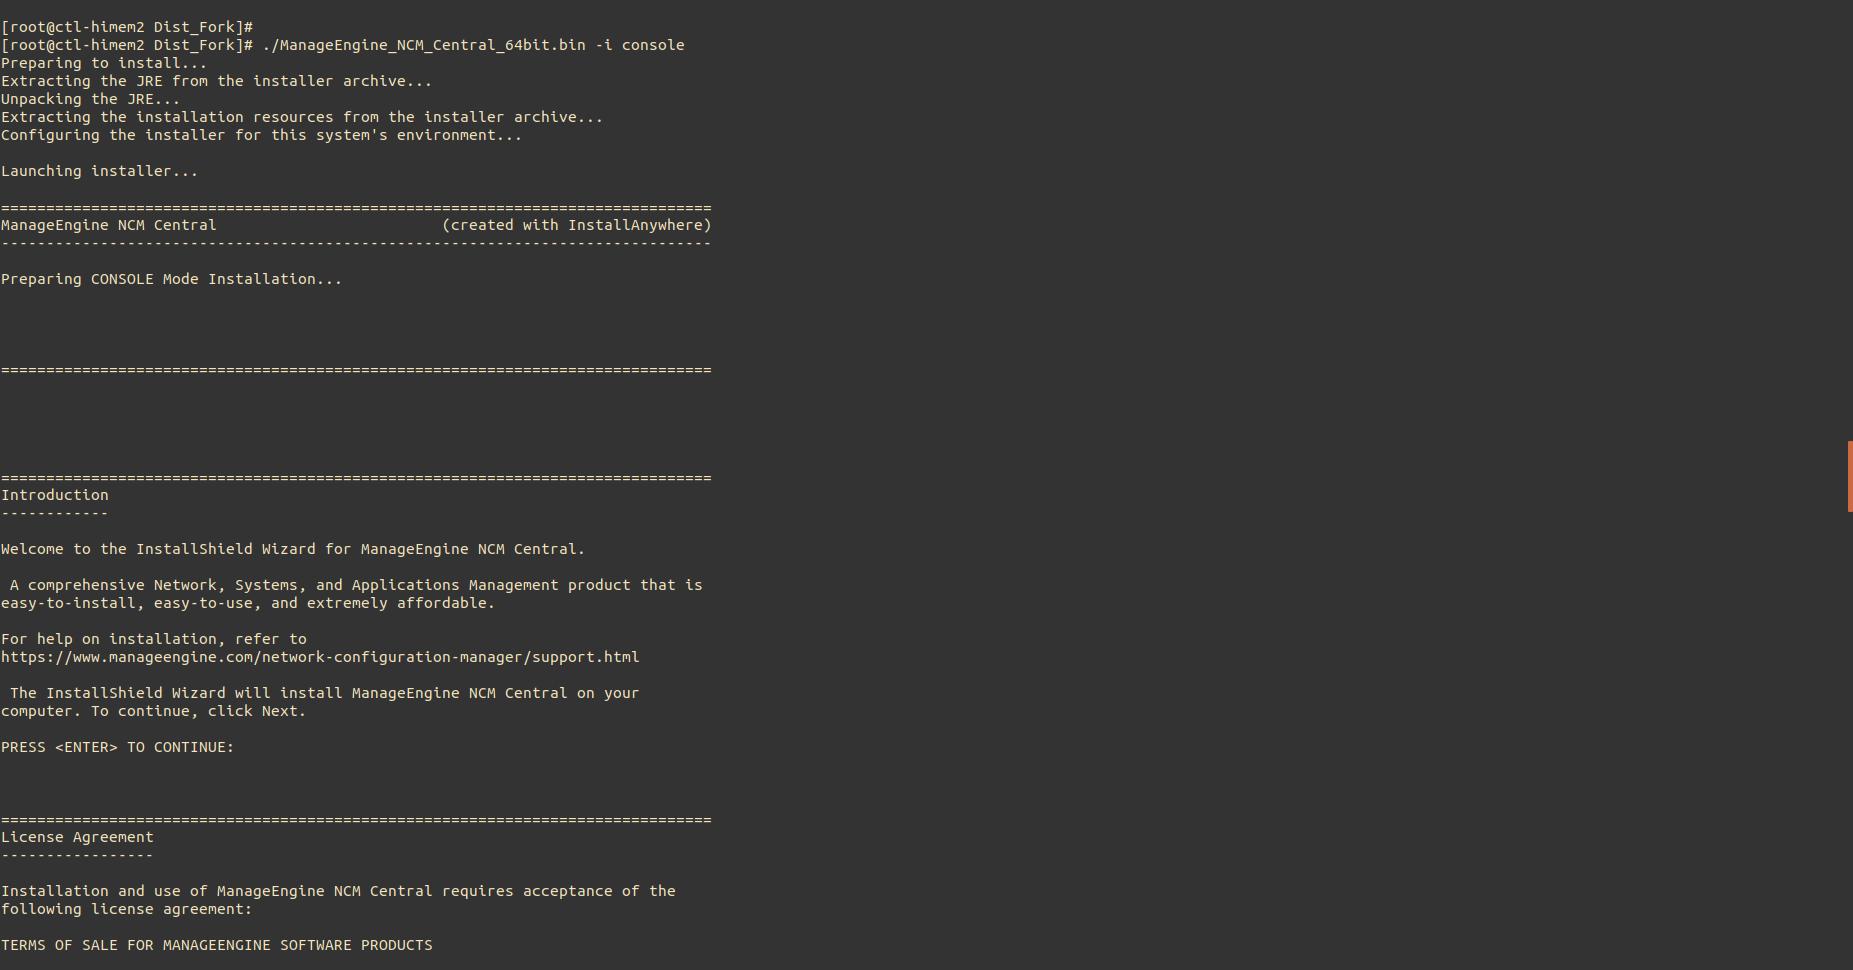 NCM Central Linux Installation Step1